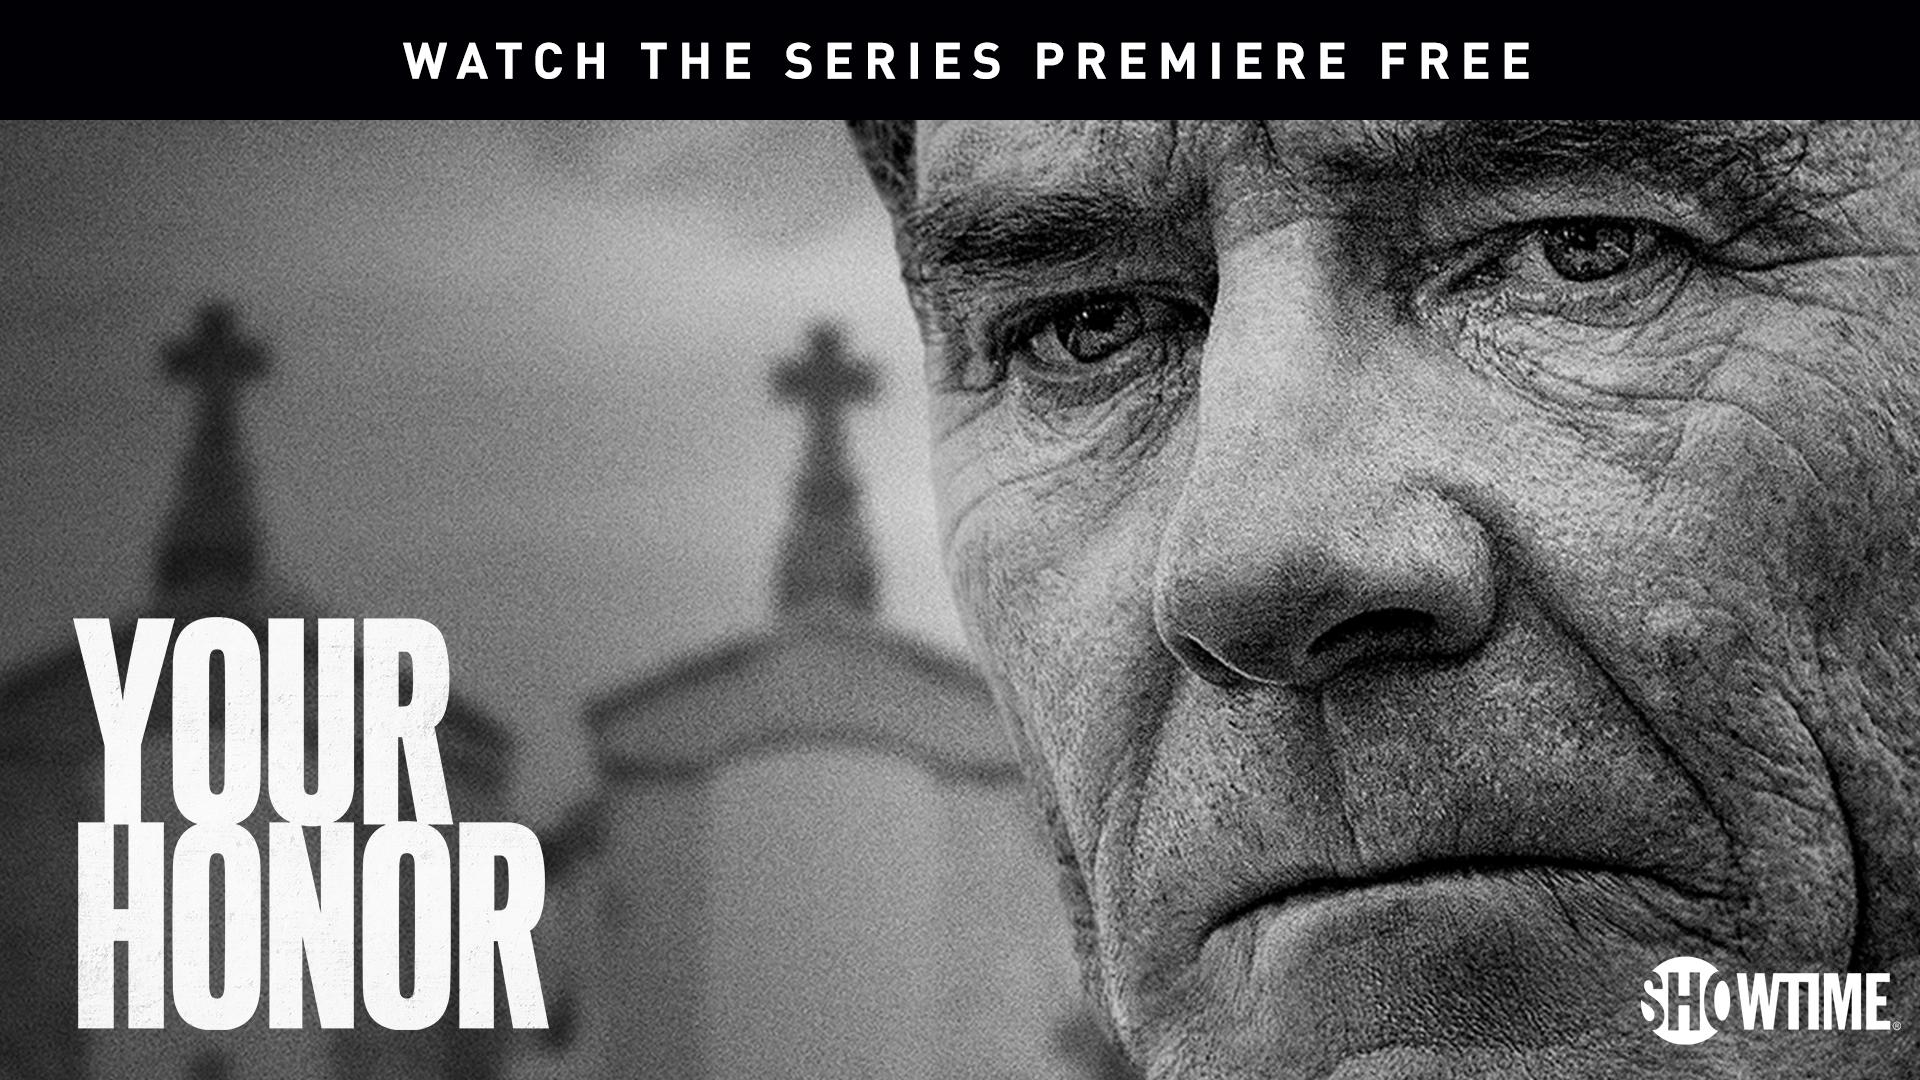 Your Honor Season 1